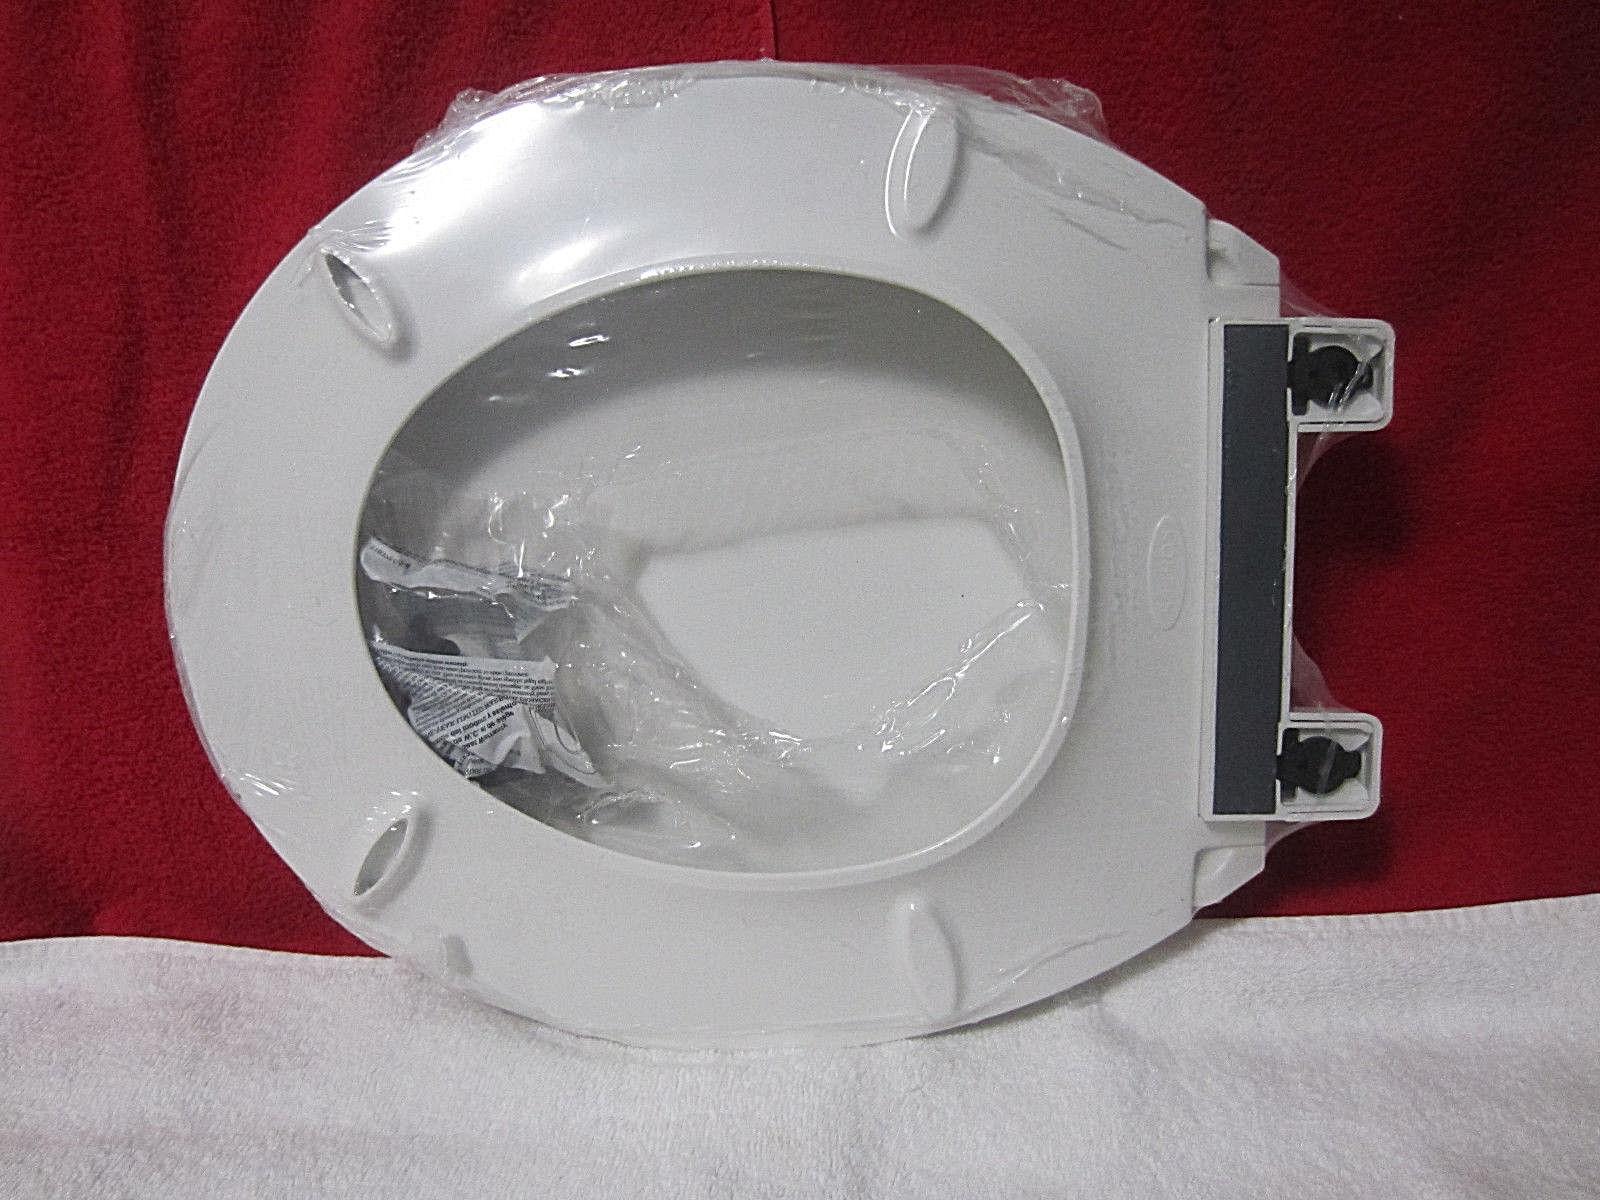 Pleasing Kohler Cachet Q3 Advantage Toilet Seat Elongated Quiet Gamerscity Chair Design For Home Gamerscityorg